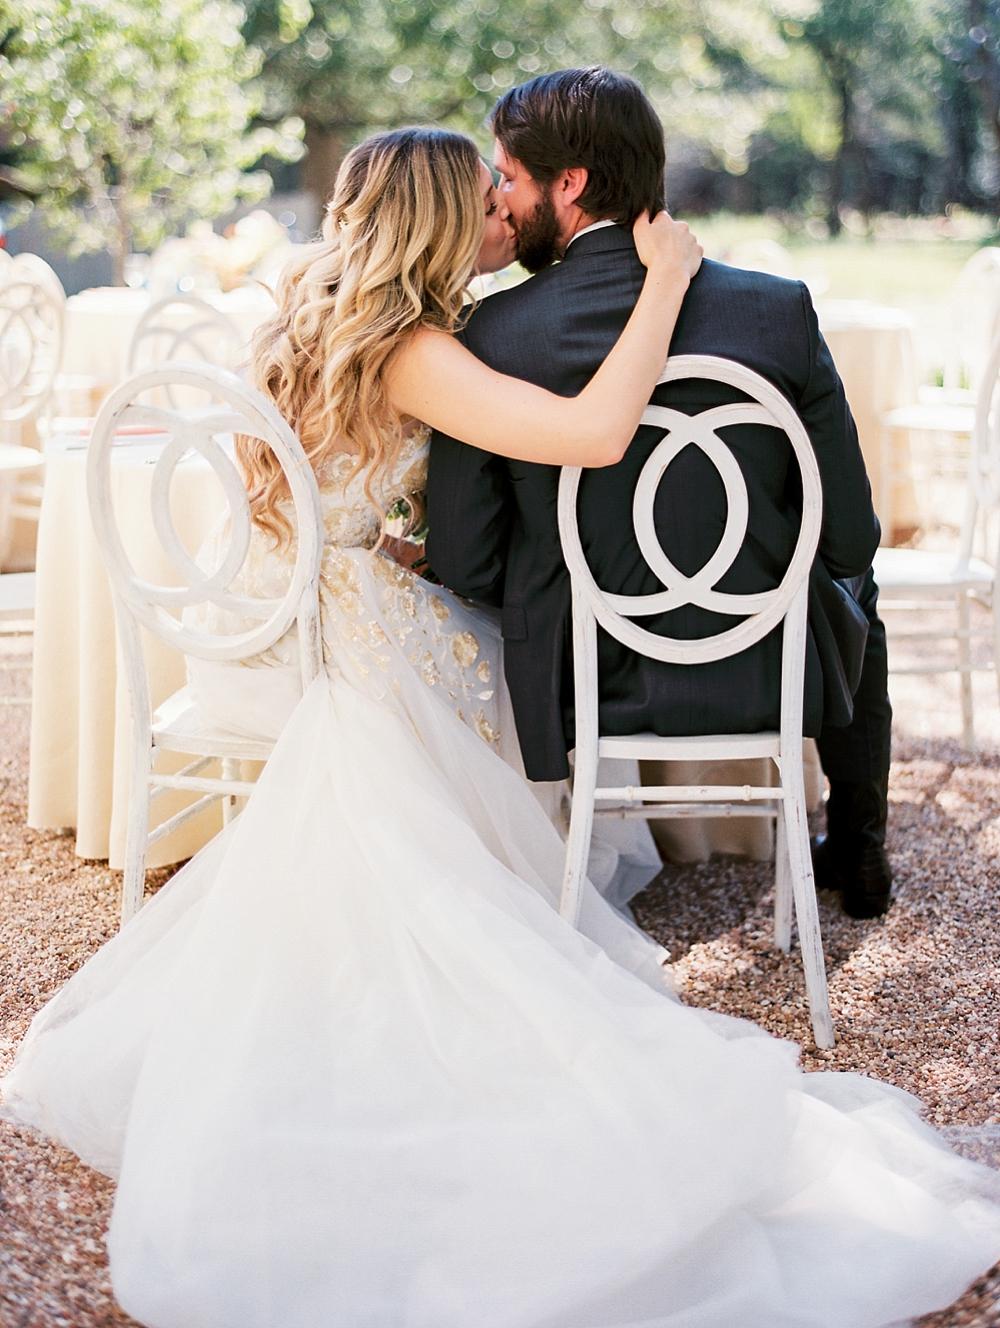 Kristin-La-Voie-Photography-Austin-Wedding-Photographer-the-grand-lady-21